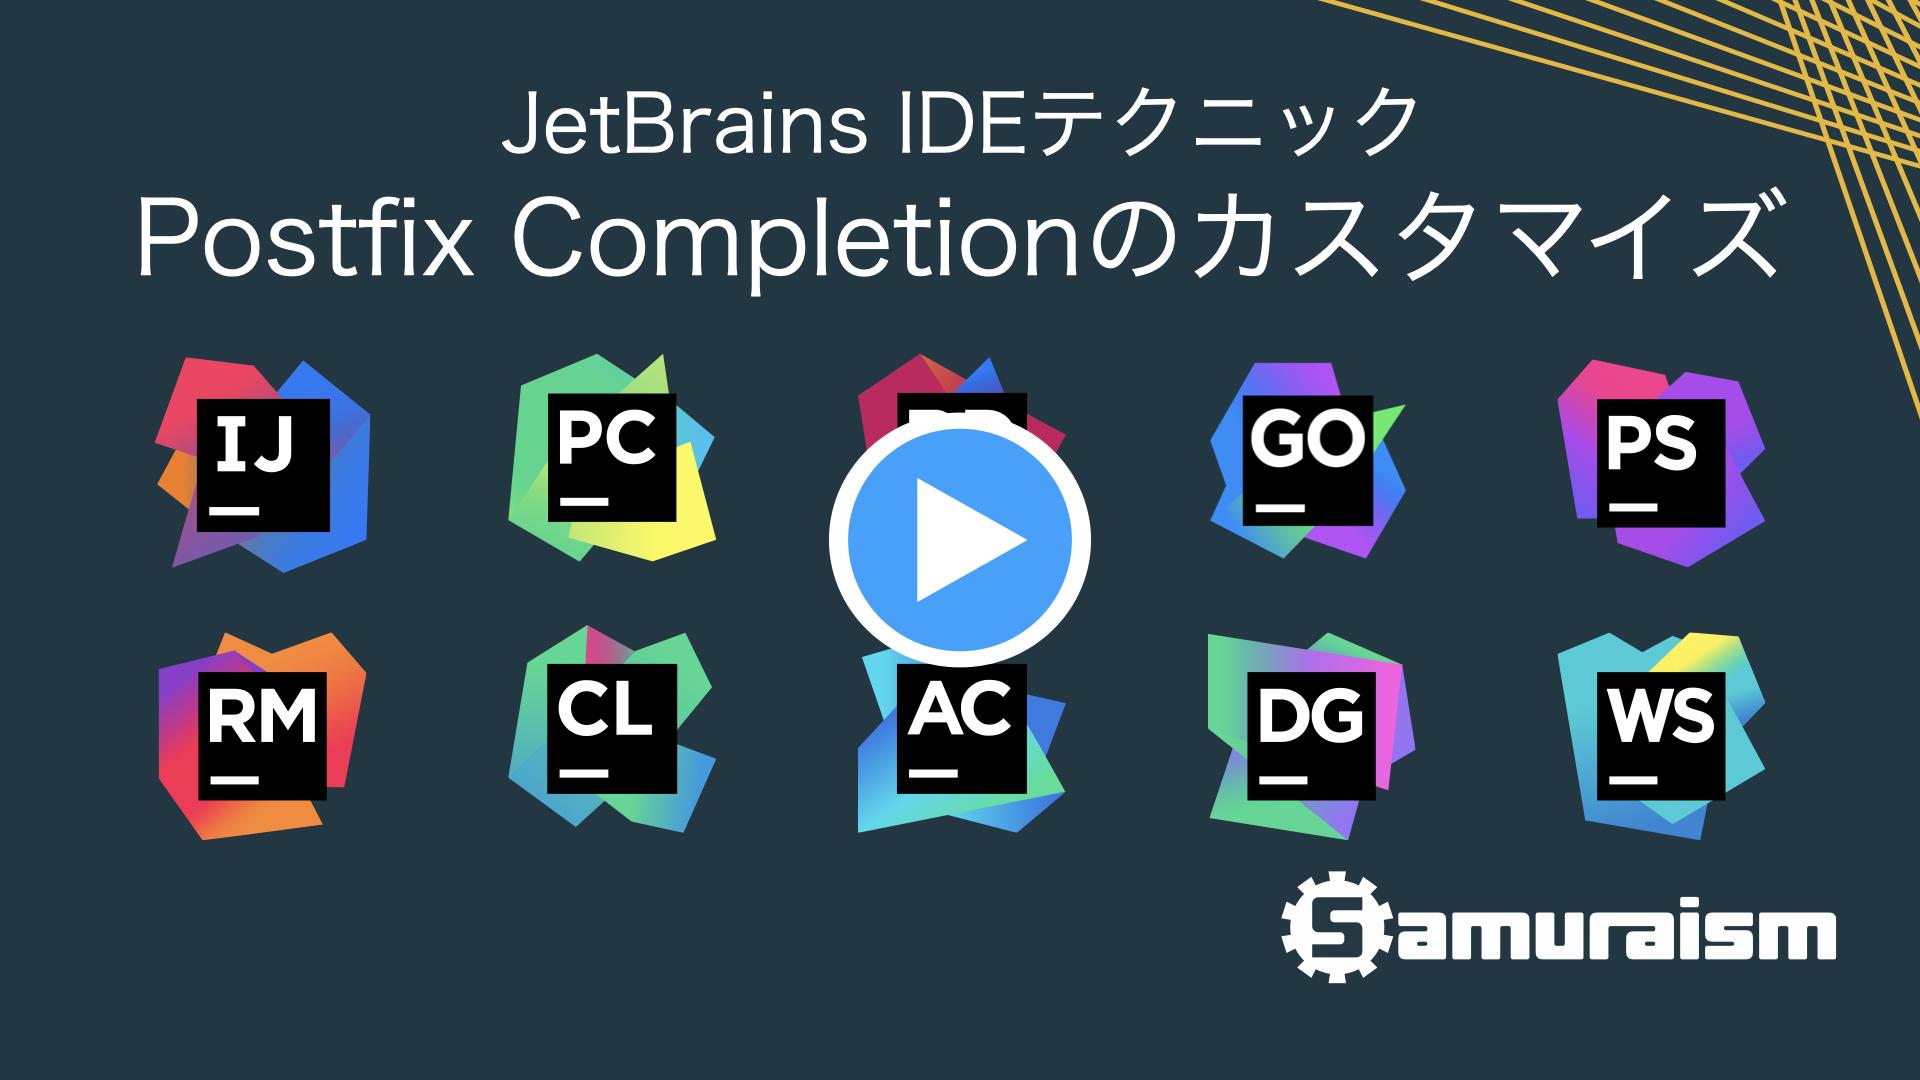 #JetBrainsIDEテクニック – Postfix Completionのカスタマイズ #jbtips